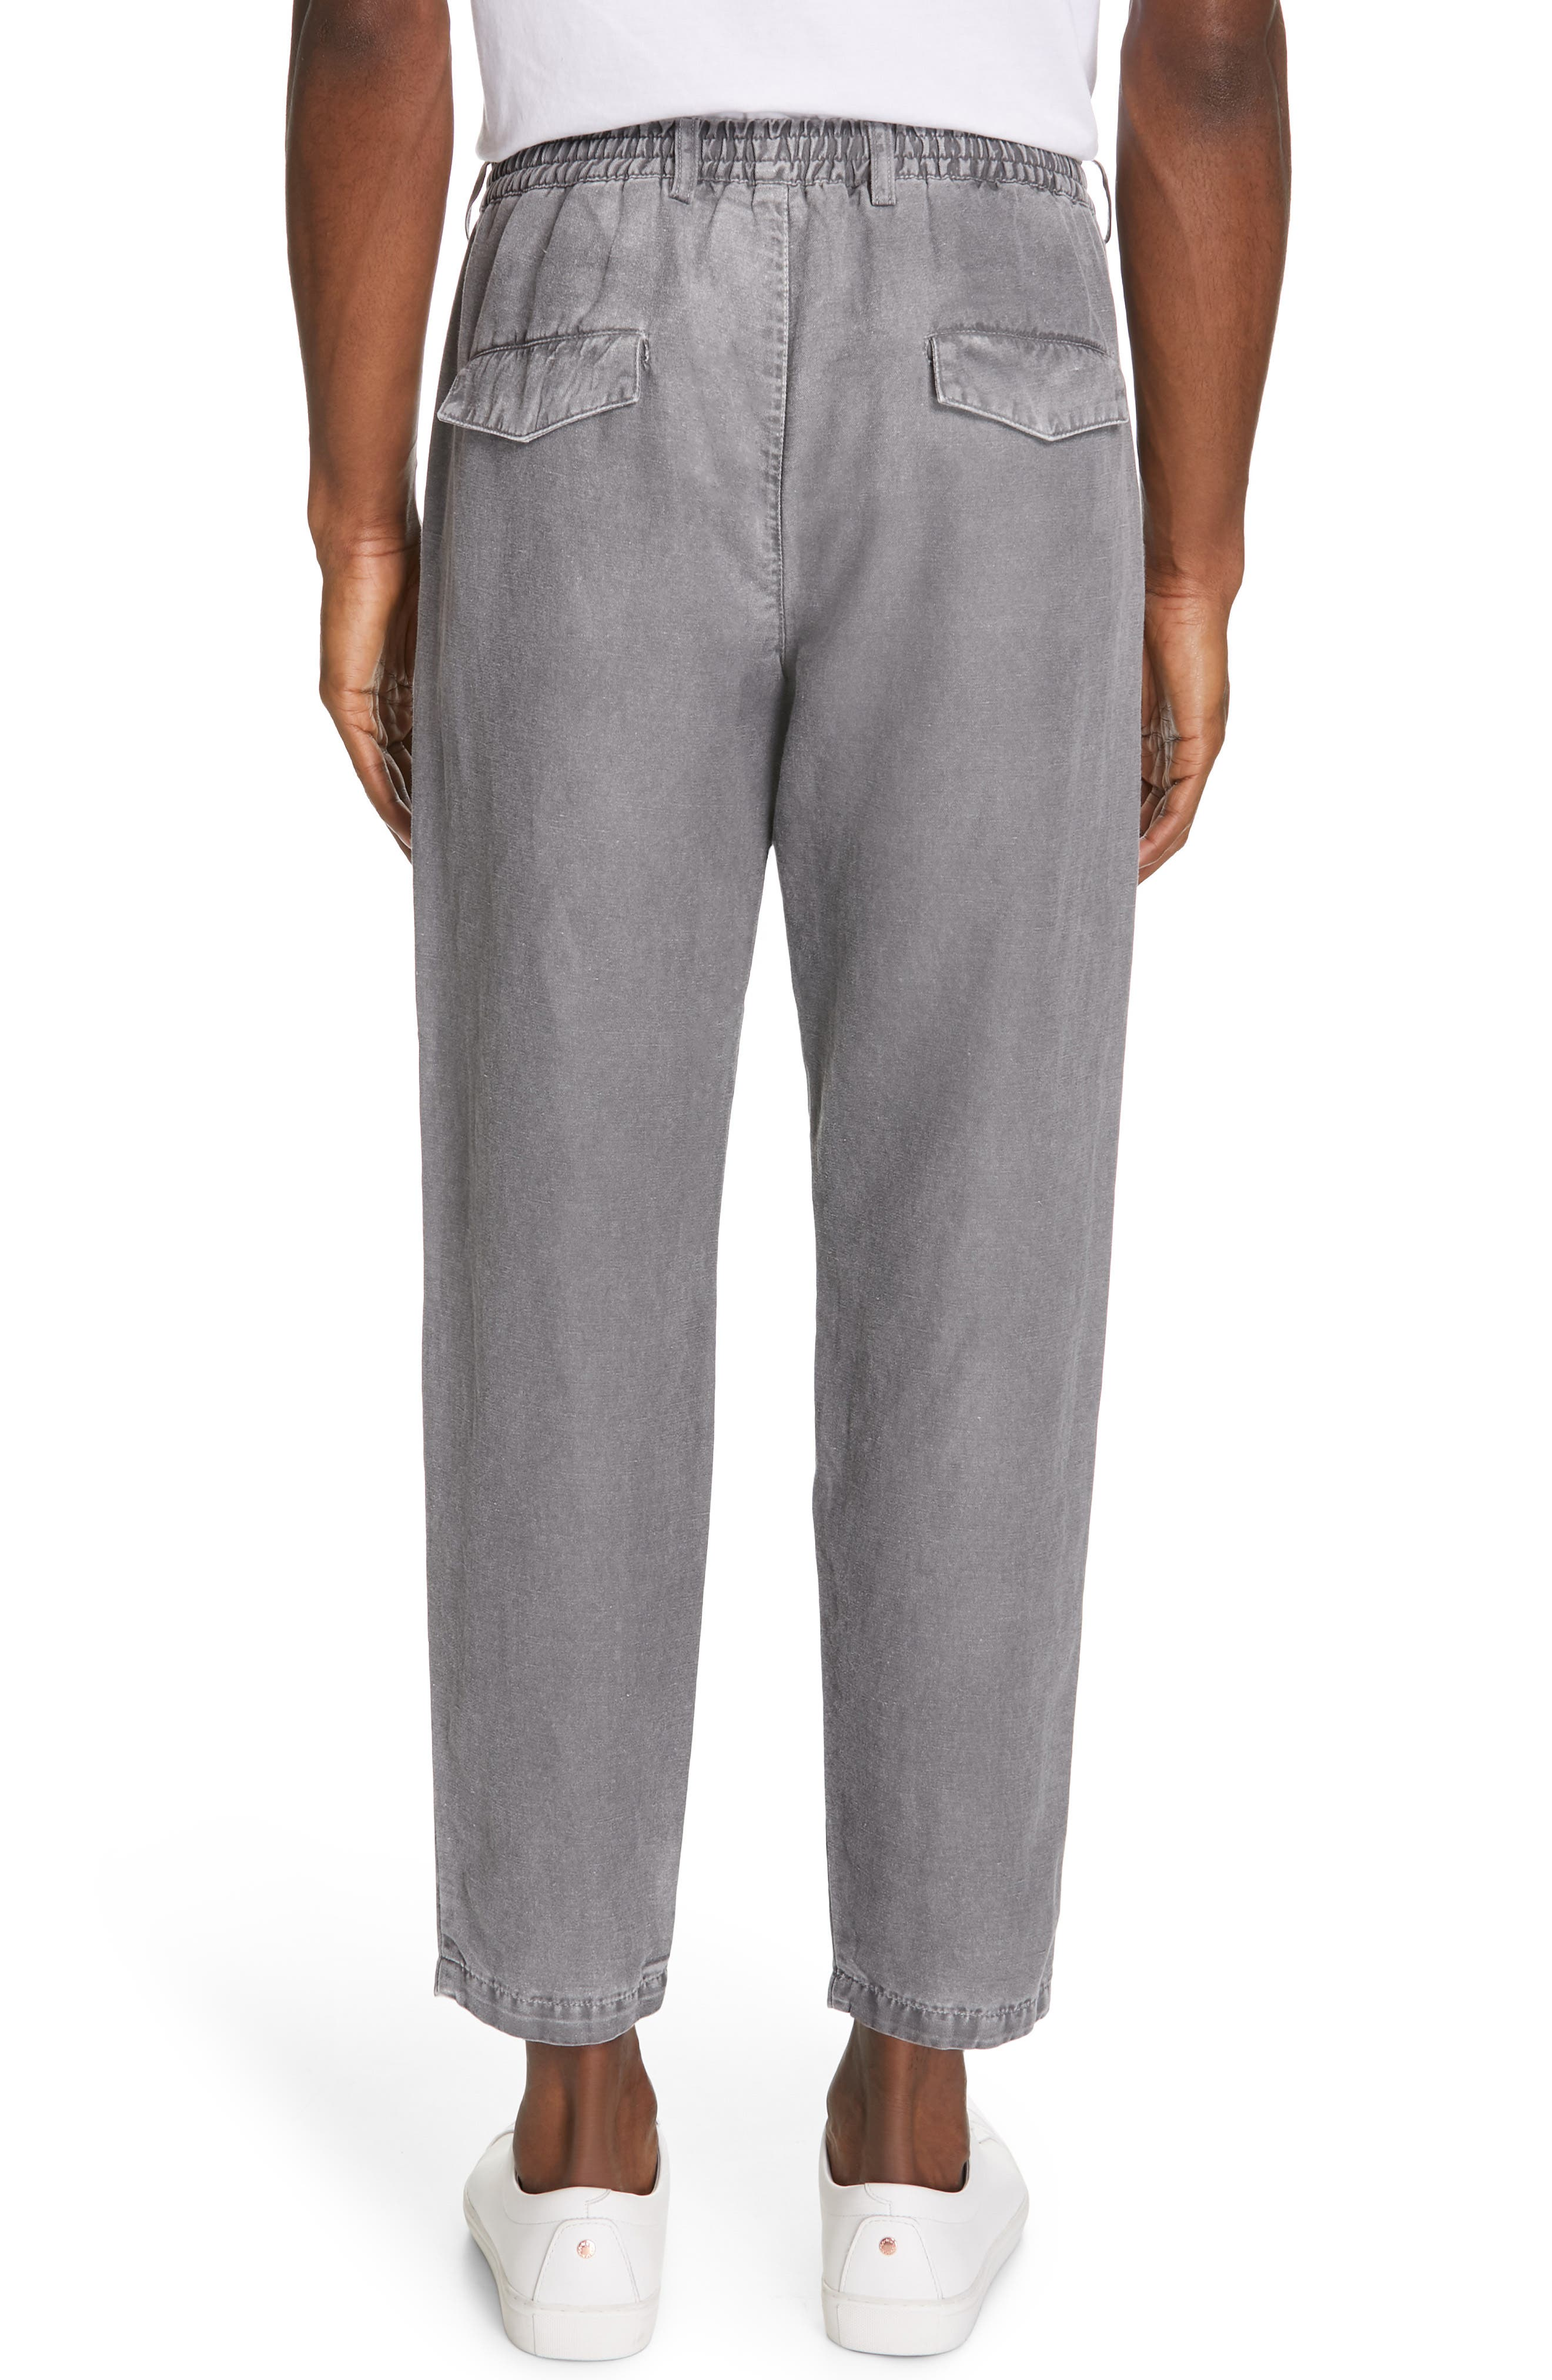 fee21fabb9836 Men s Linen Pants